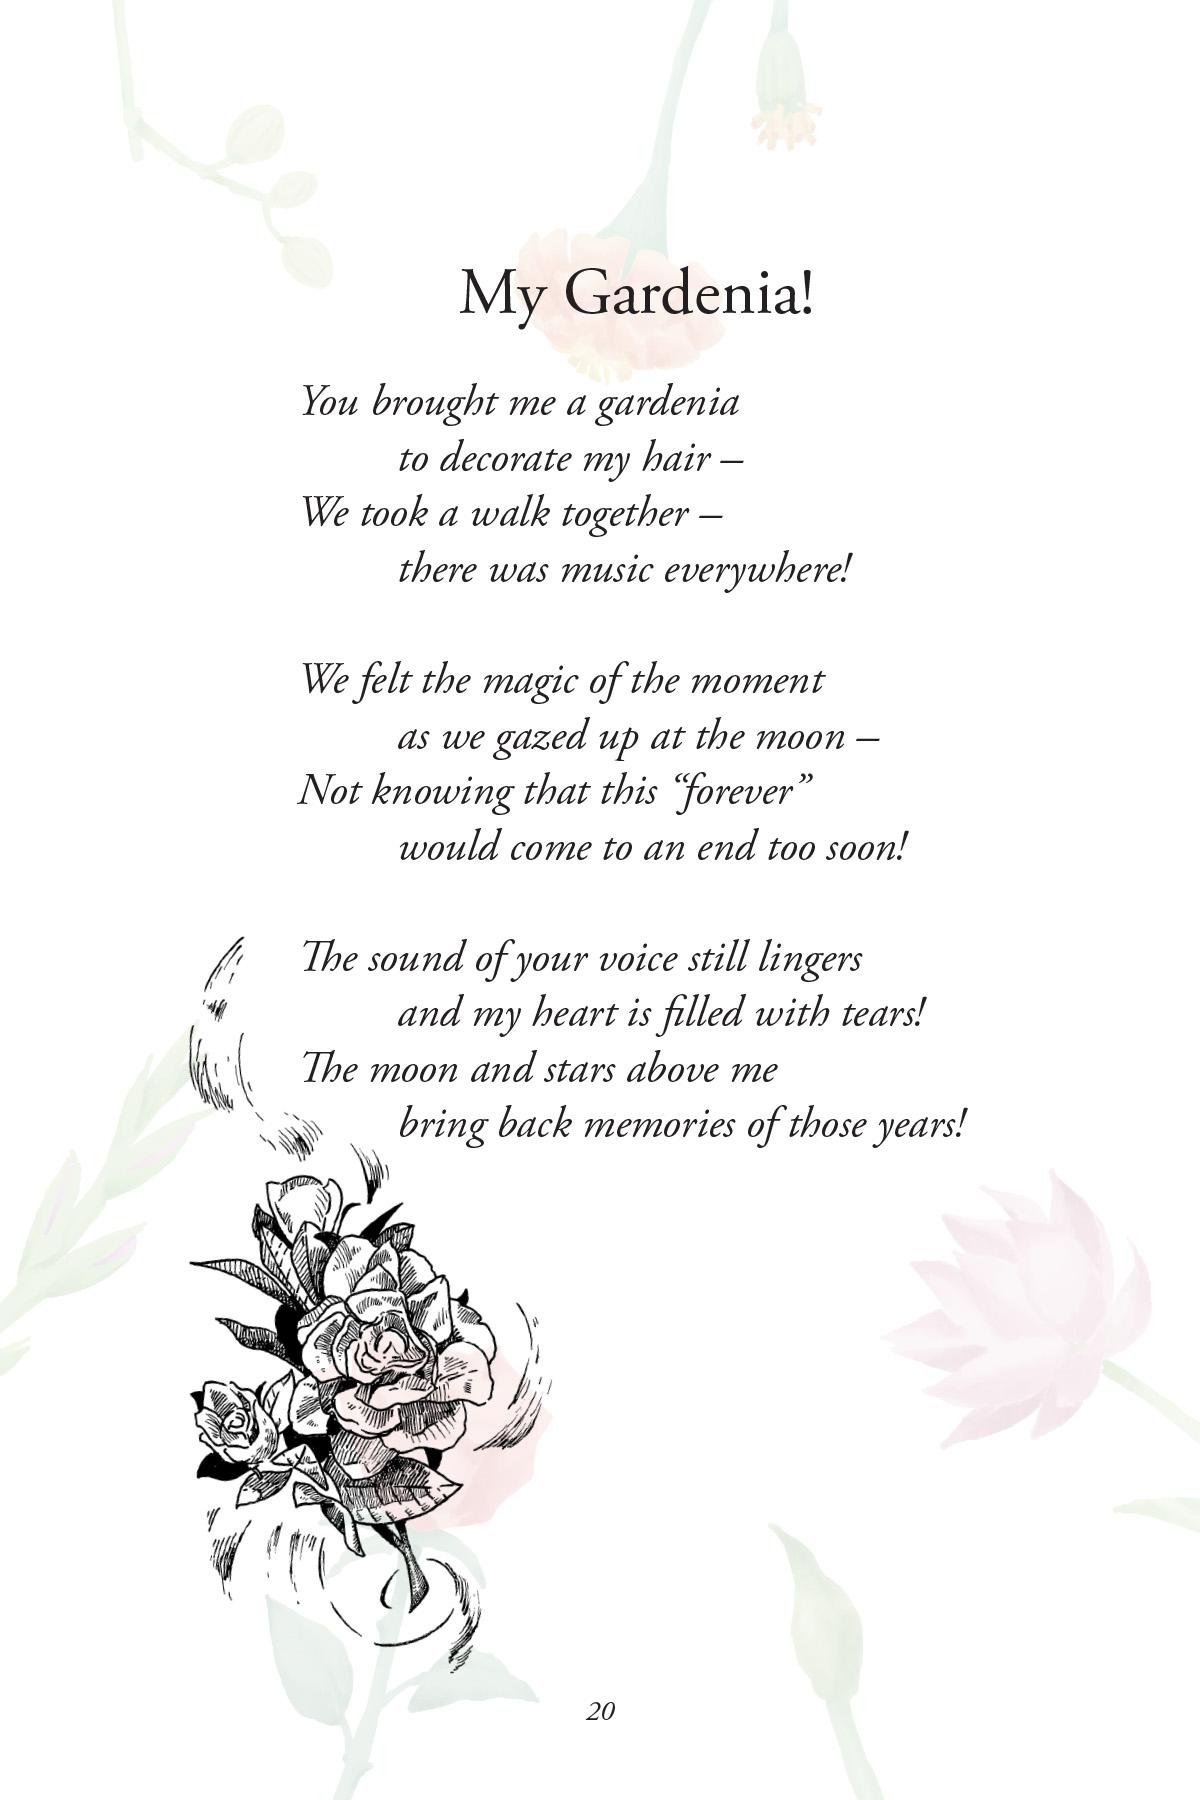 MyLittleBookOfPoetry_Layout_Poem-MyGardenia-WEB